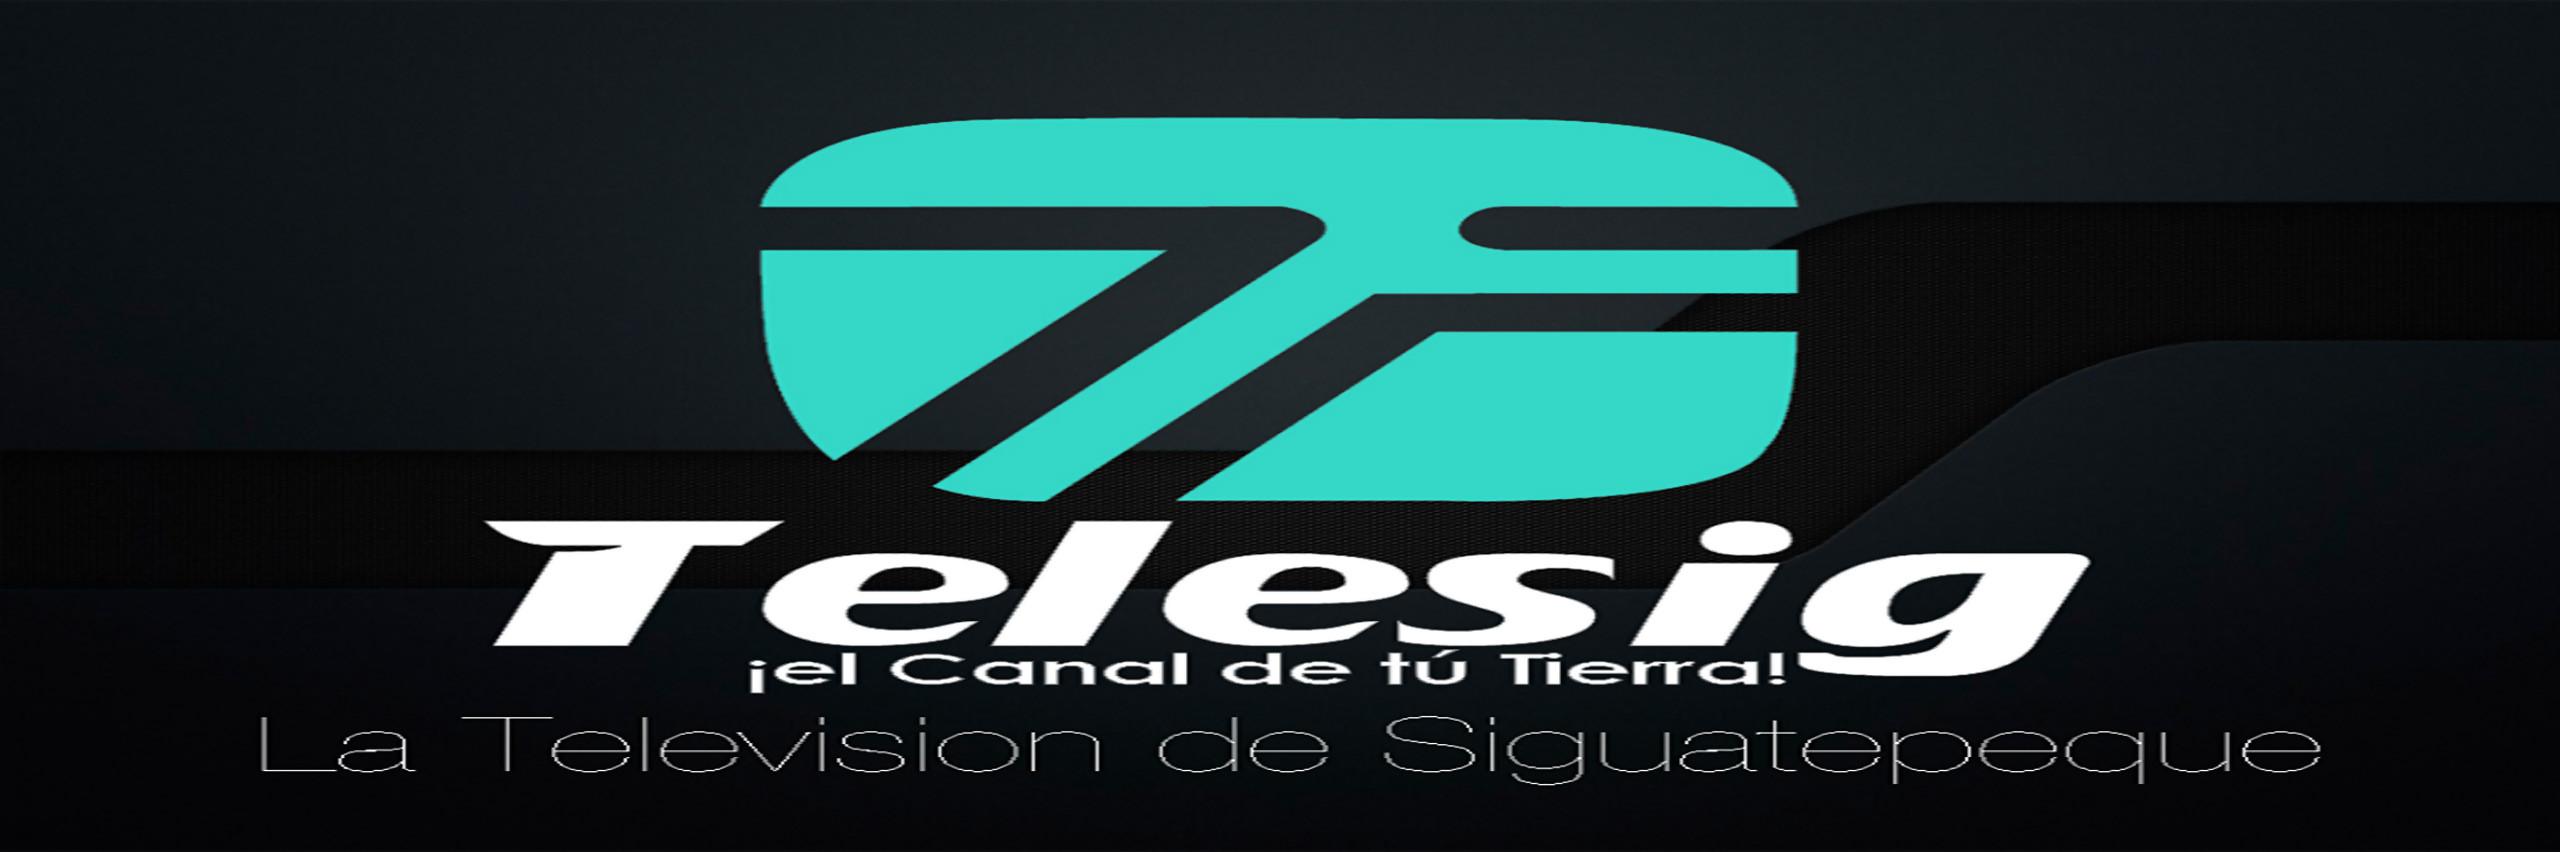 TelesigCanal34